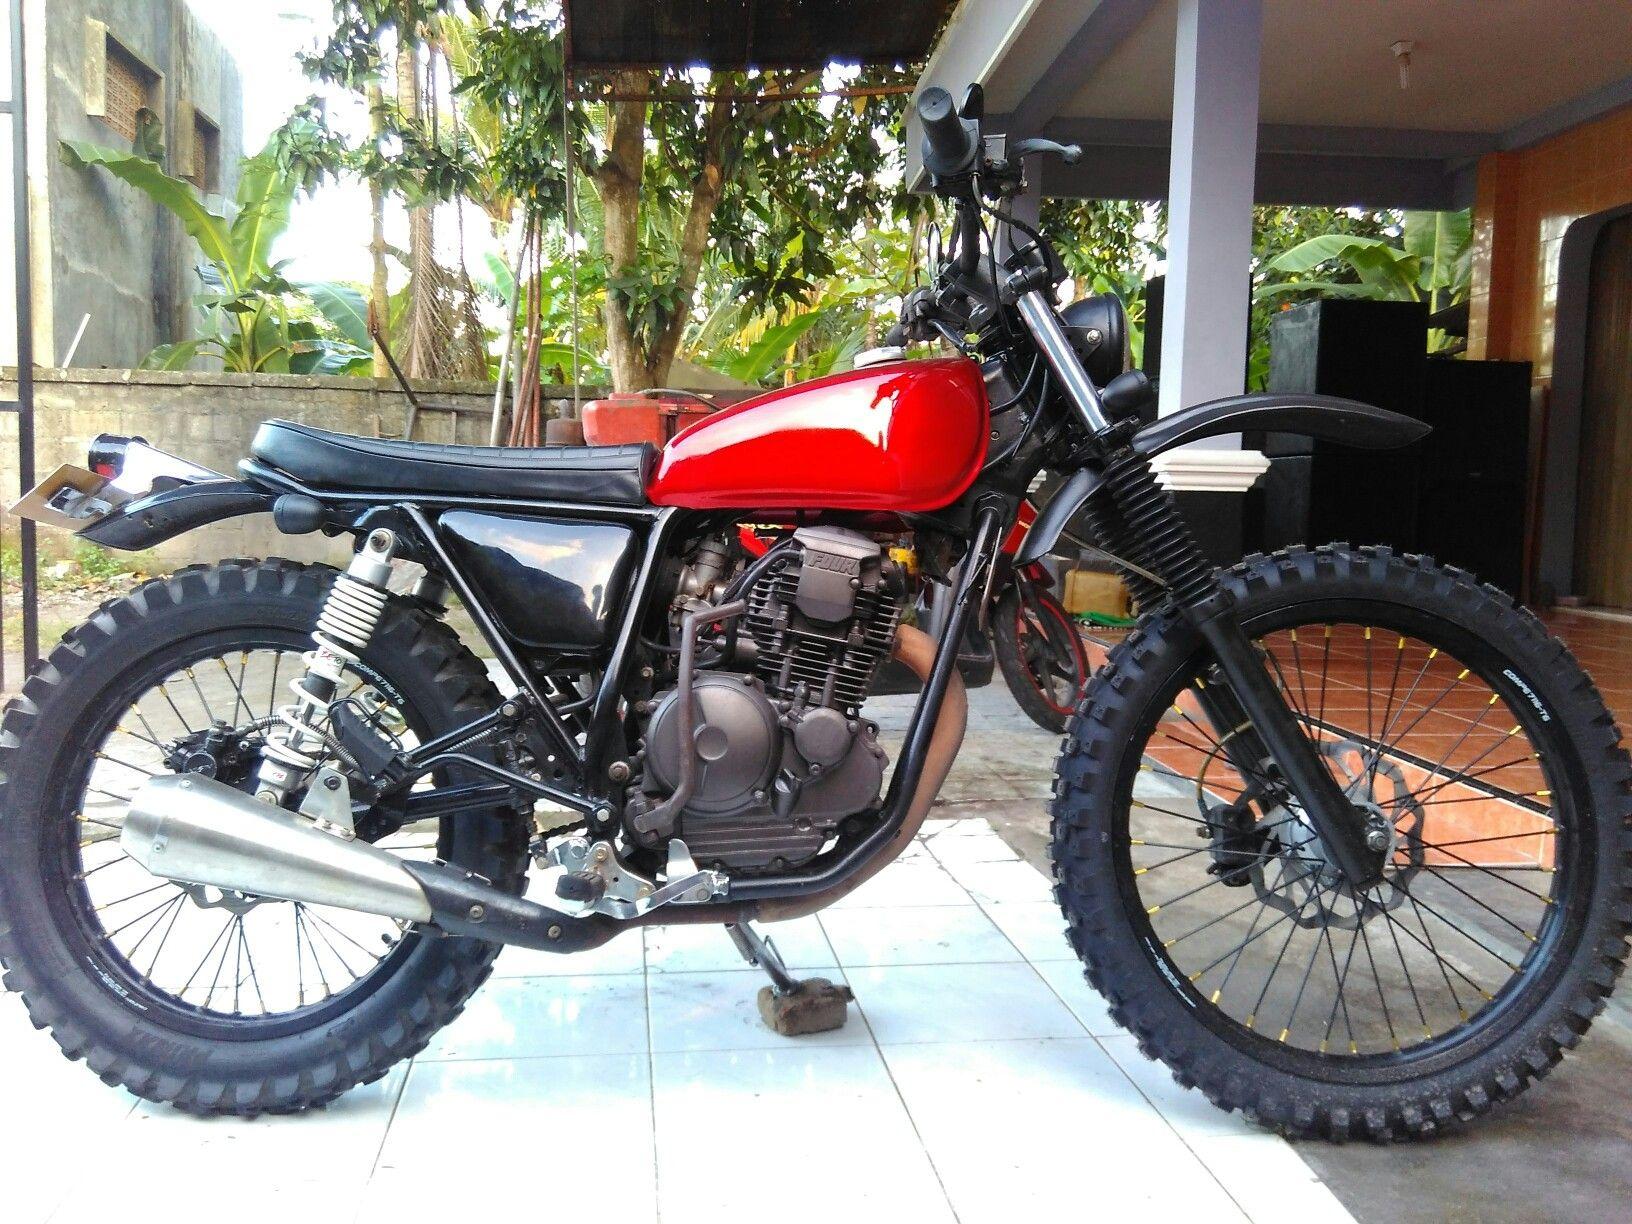 Yamaha Scorpio Scrambler Vintage Dirt Bike 225 Ssx Revo Fit Raving Red Bantul Cafe